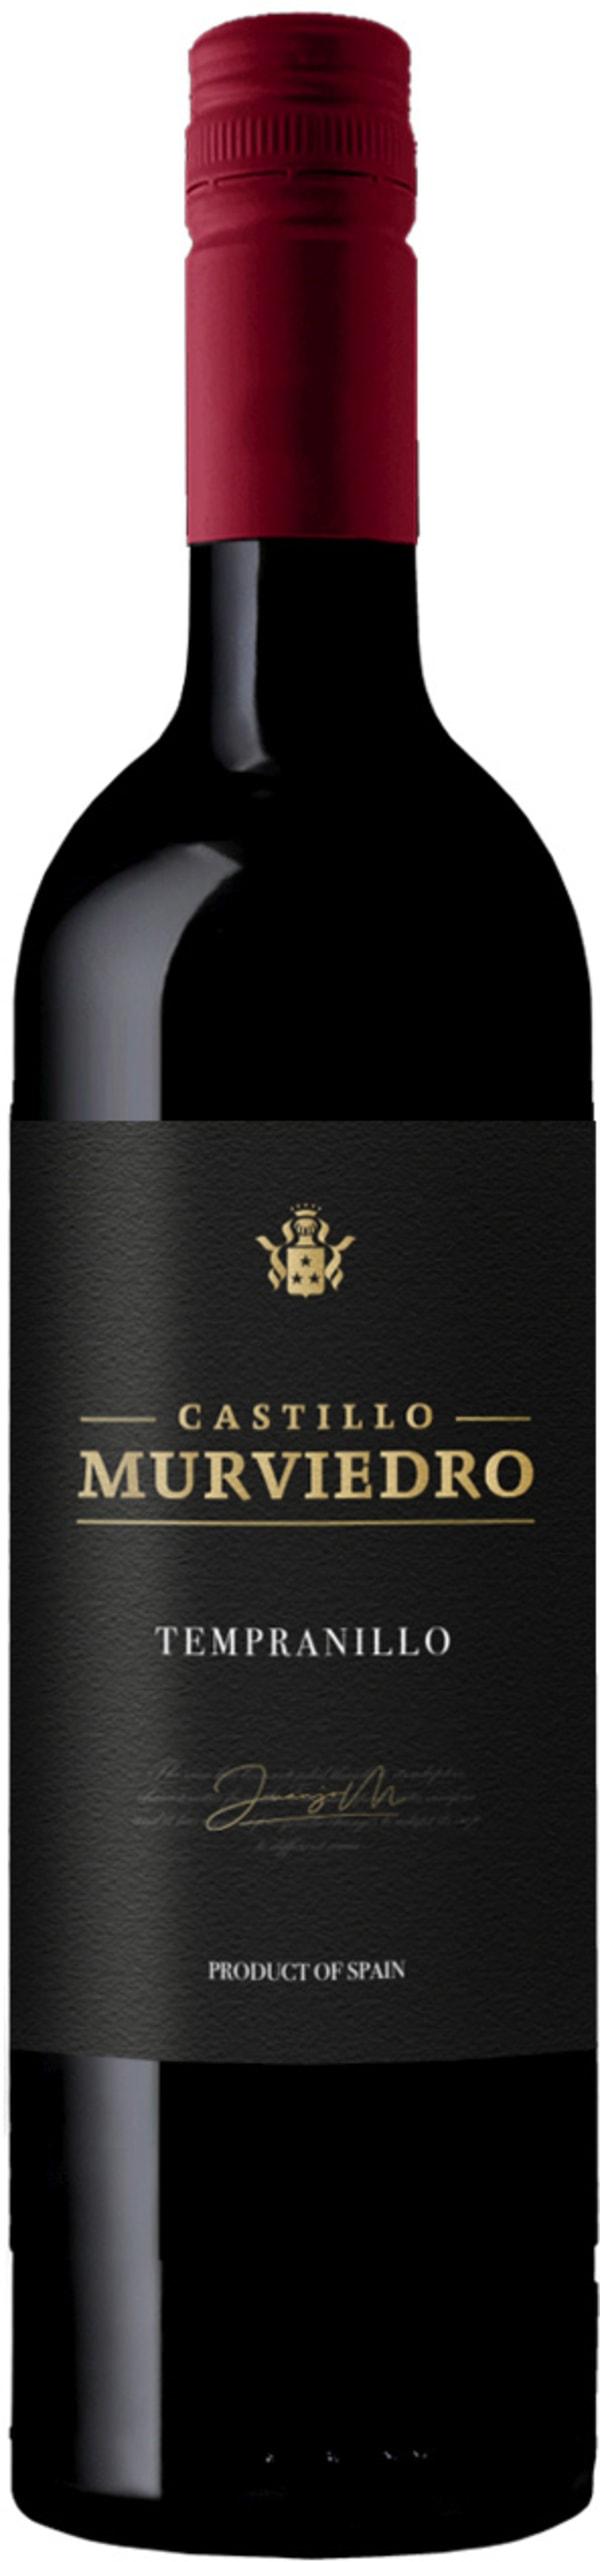 Castillo Murviedro Tempranillo 2018